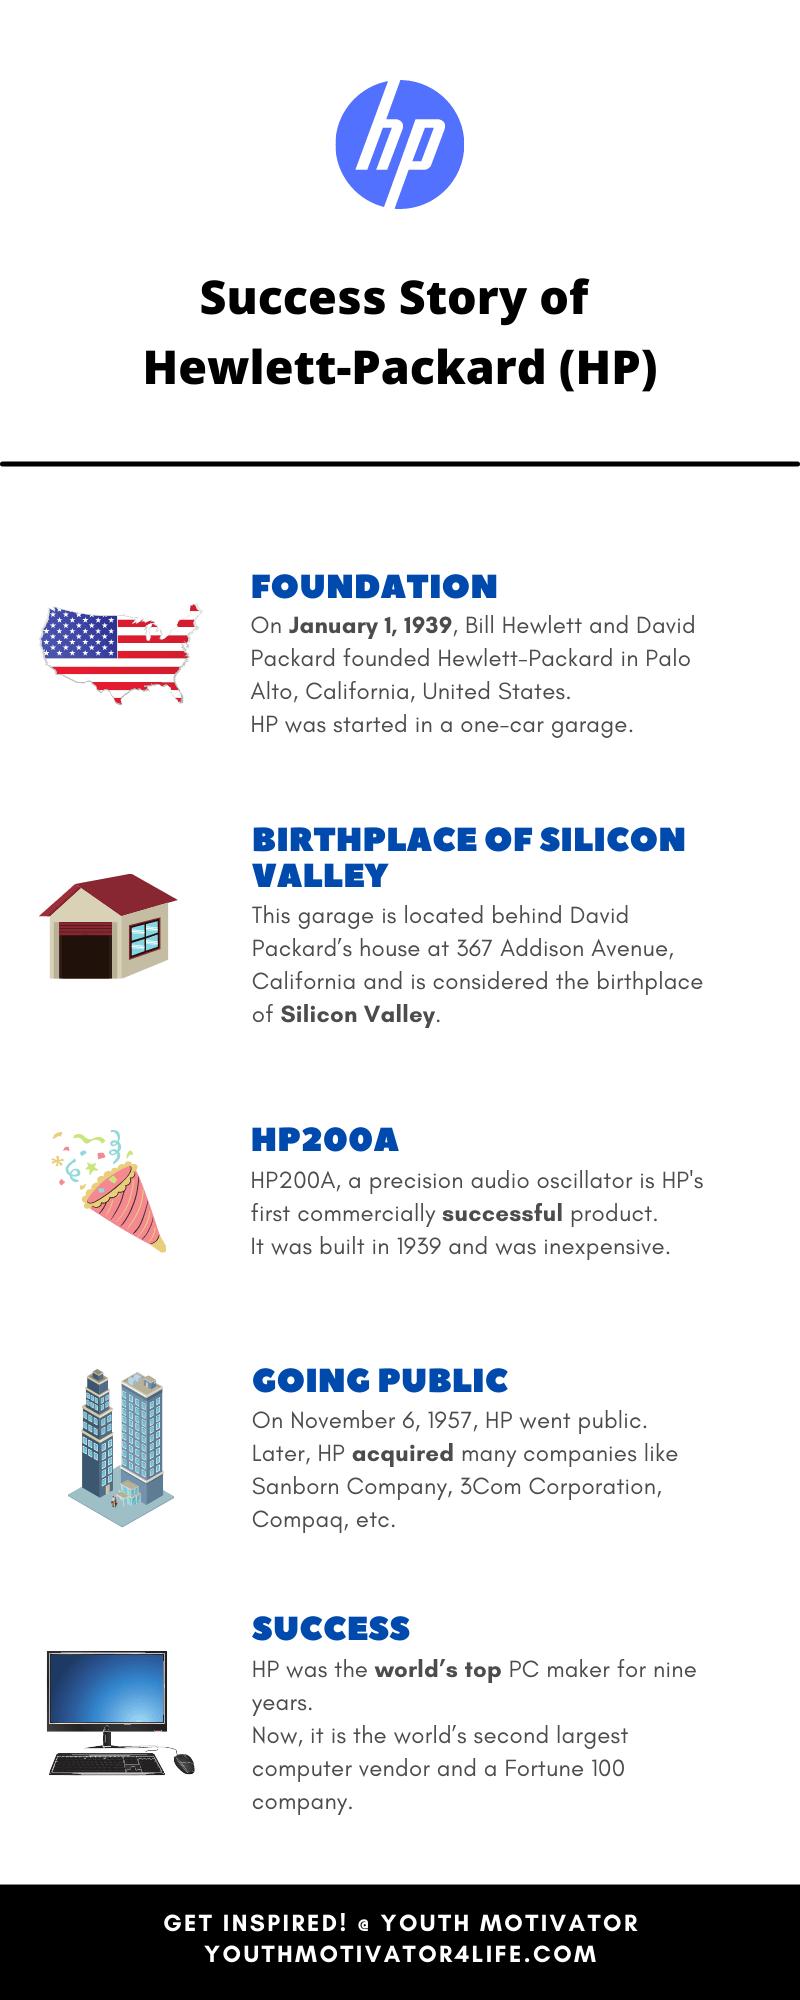 An infographic on story of Hewlett-Packard (HP)